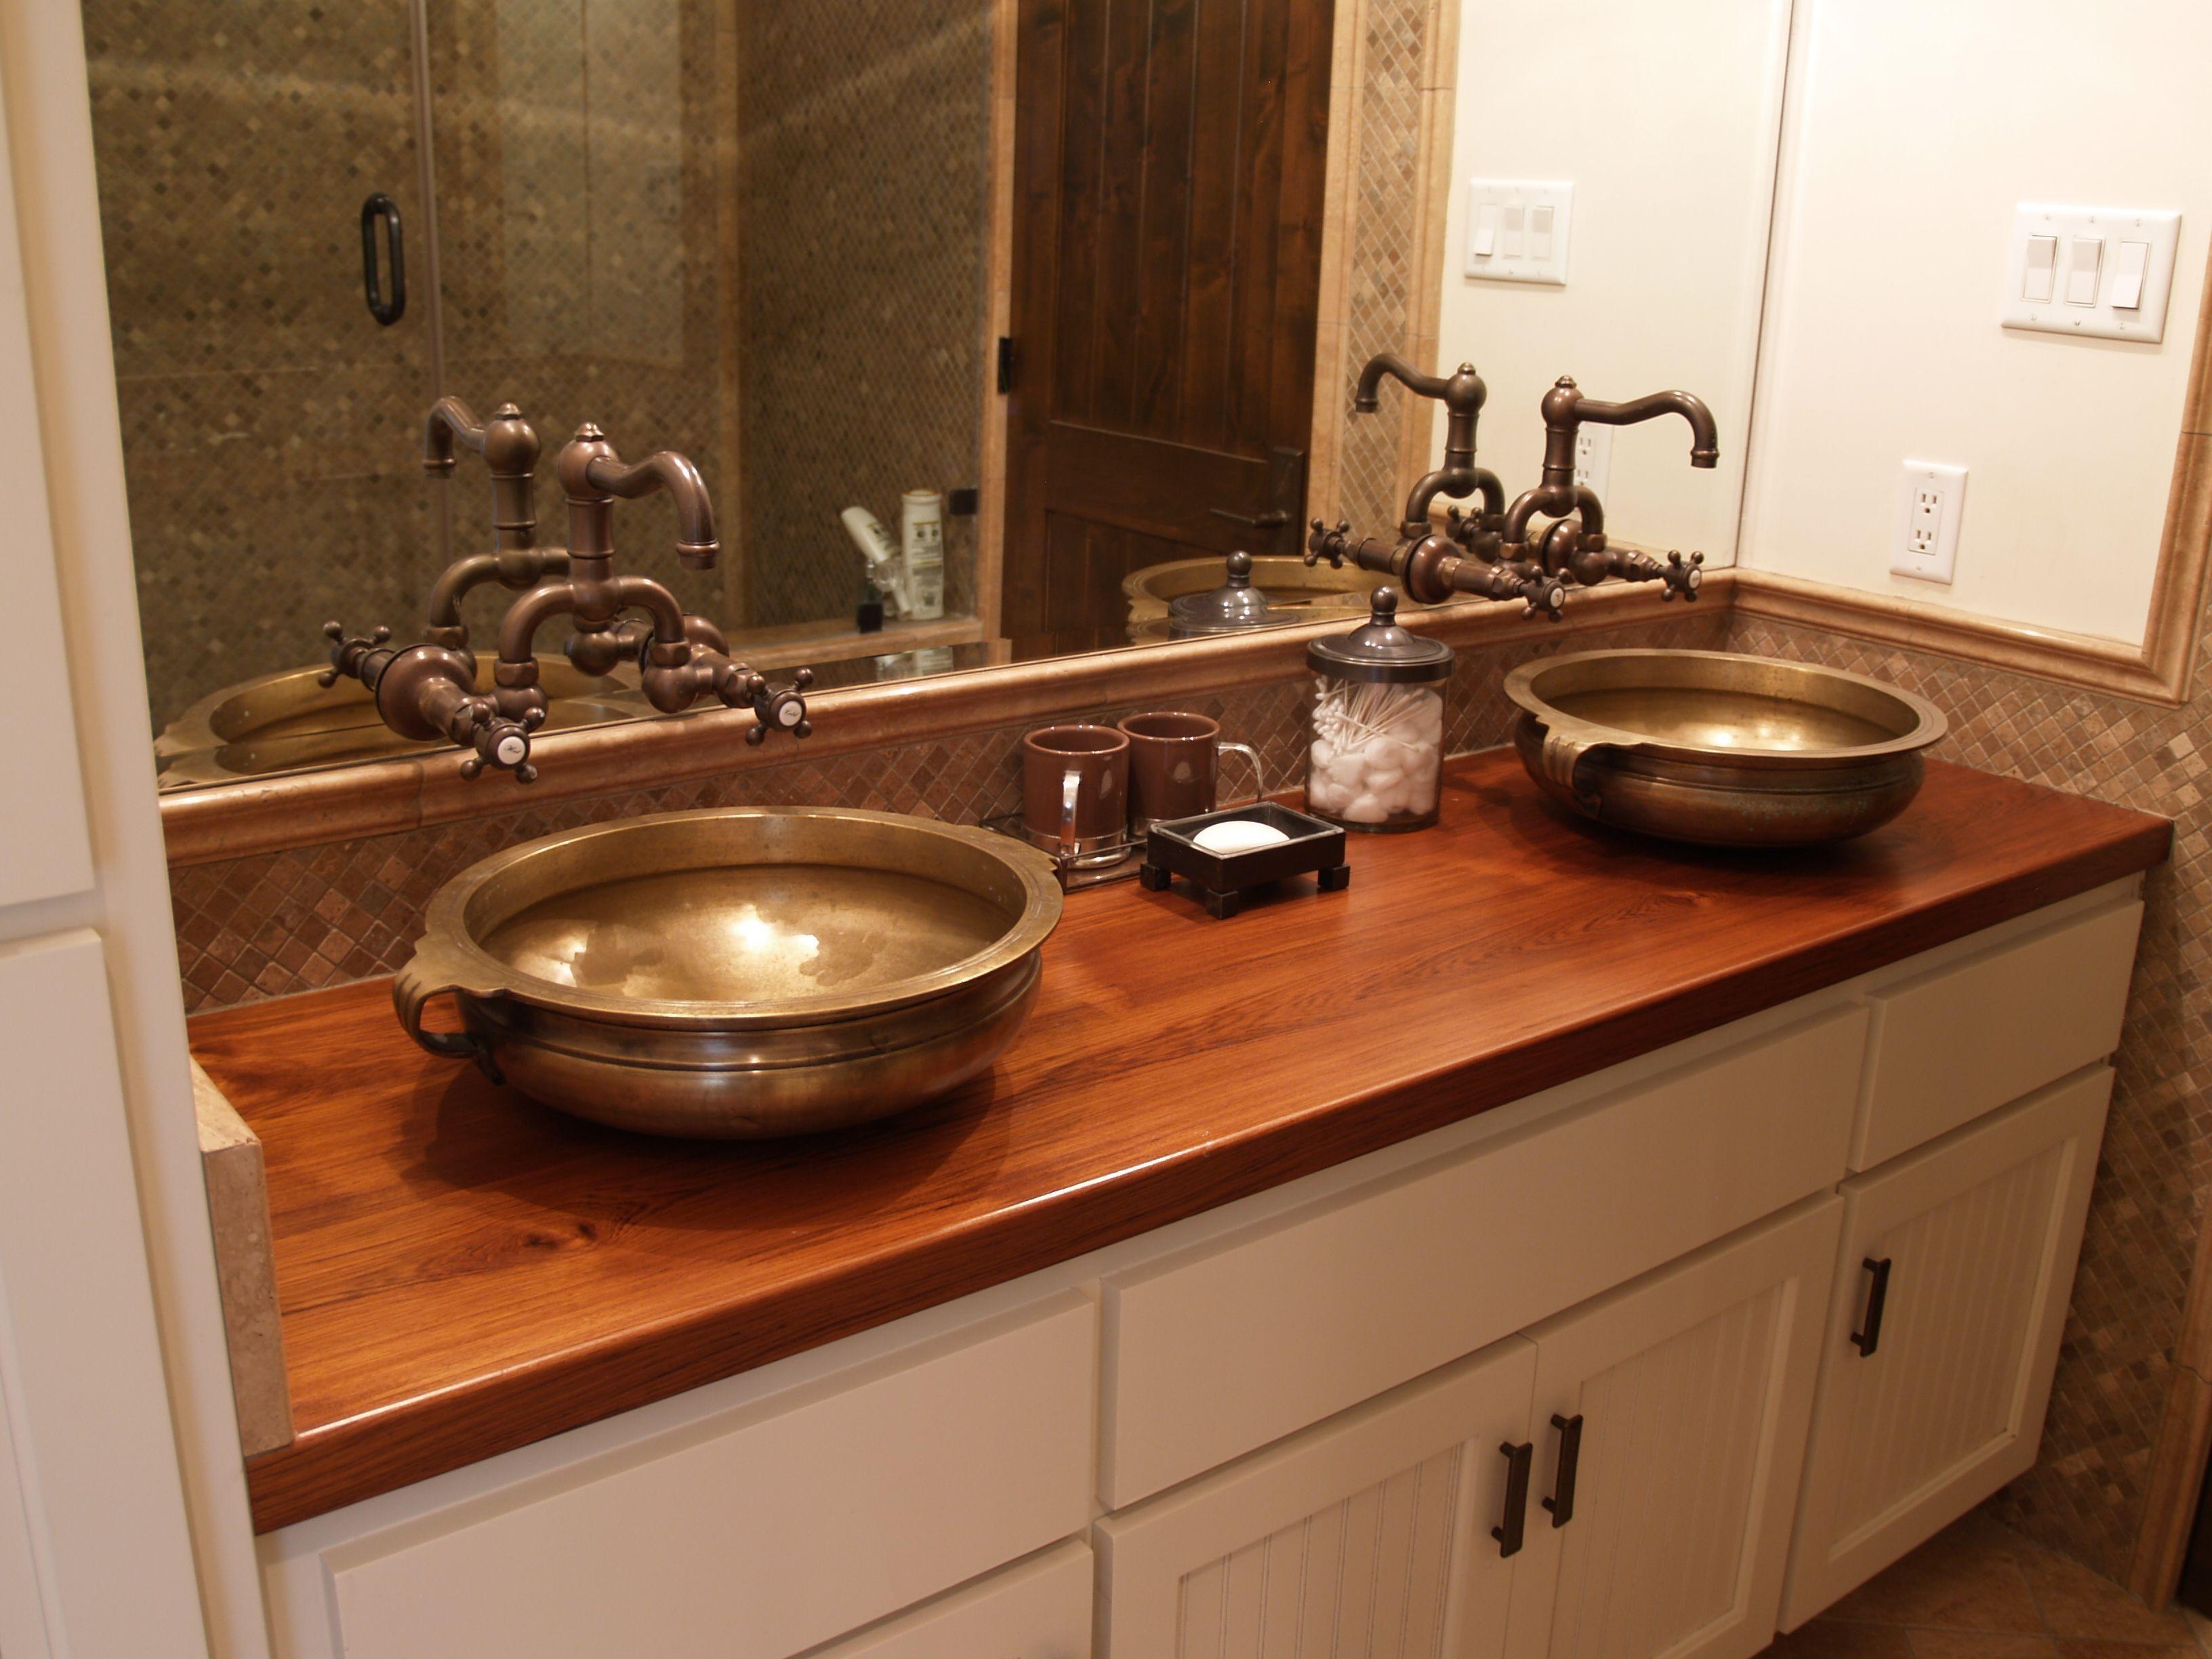 Teak Wood Countertop Photo Gallery Bathroom Countertops Wood